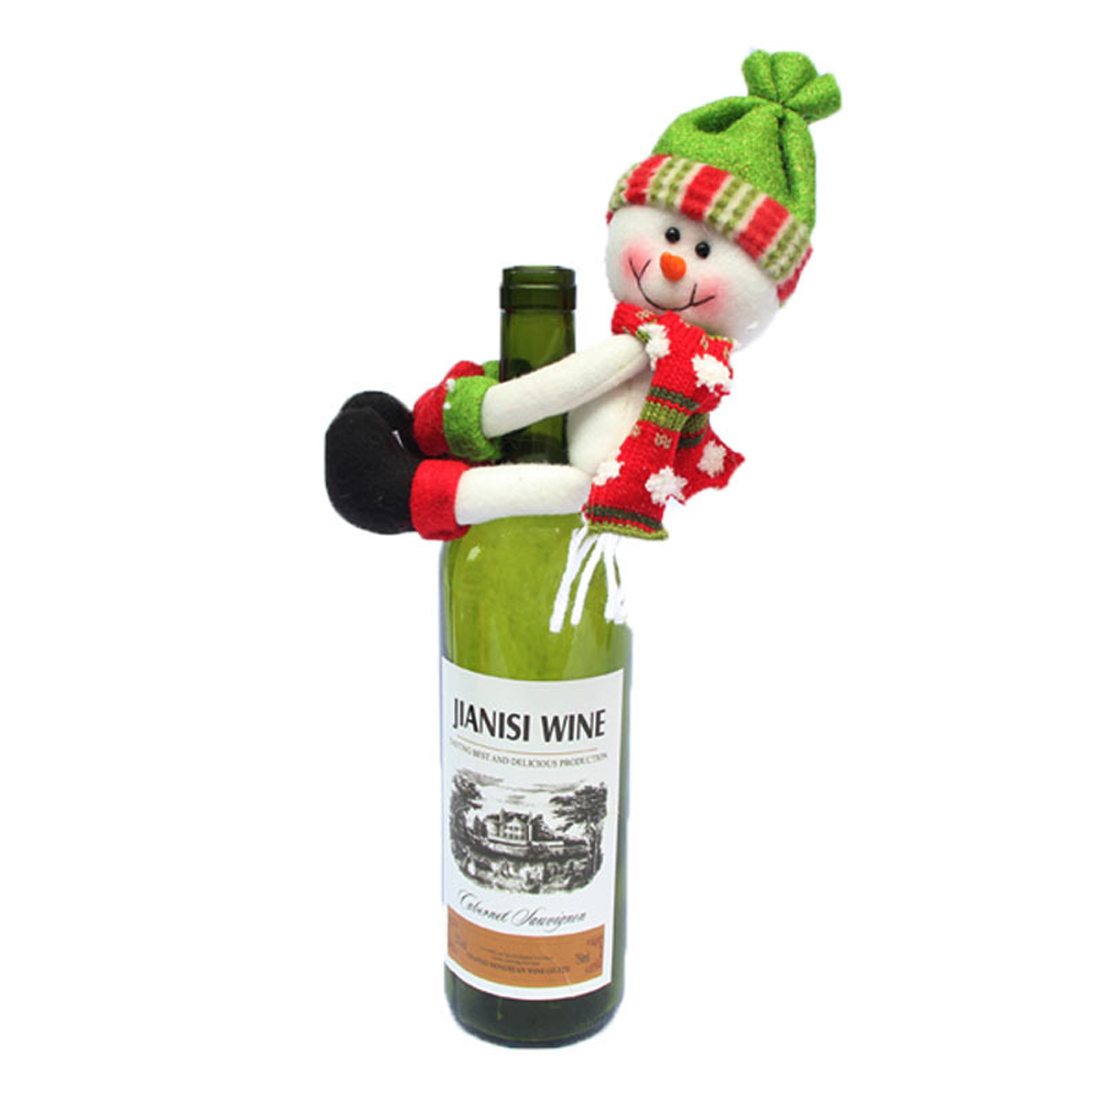 Useful Santa Claus Wine Bottle Cover Christmas Decorations For Home Snowman Bottle Pendant Sets Xmas Dinner Table Decor